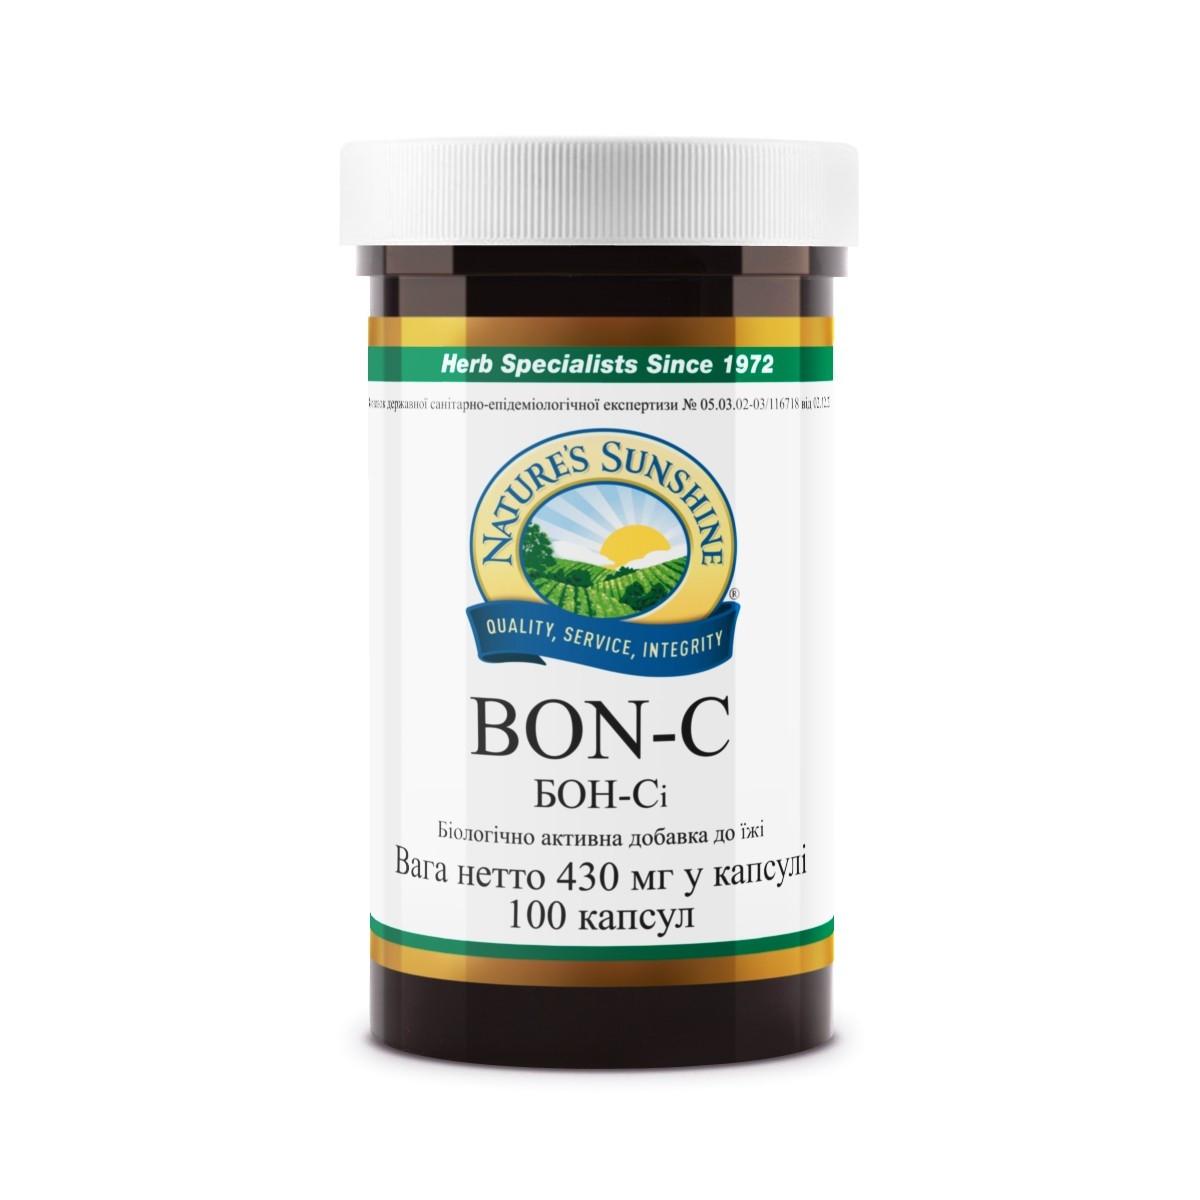 БОН-СИ (BON-C) бад НСП.